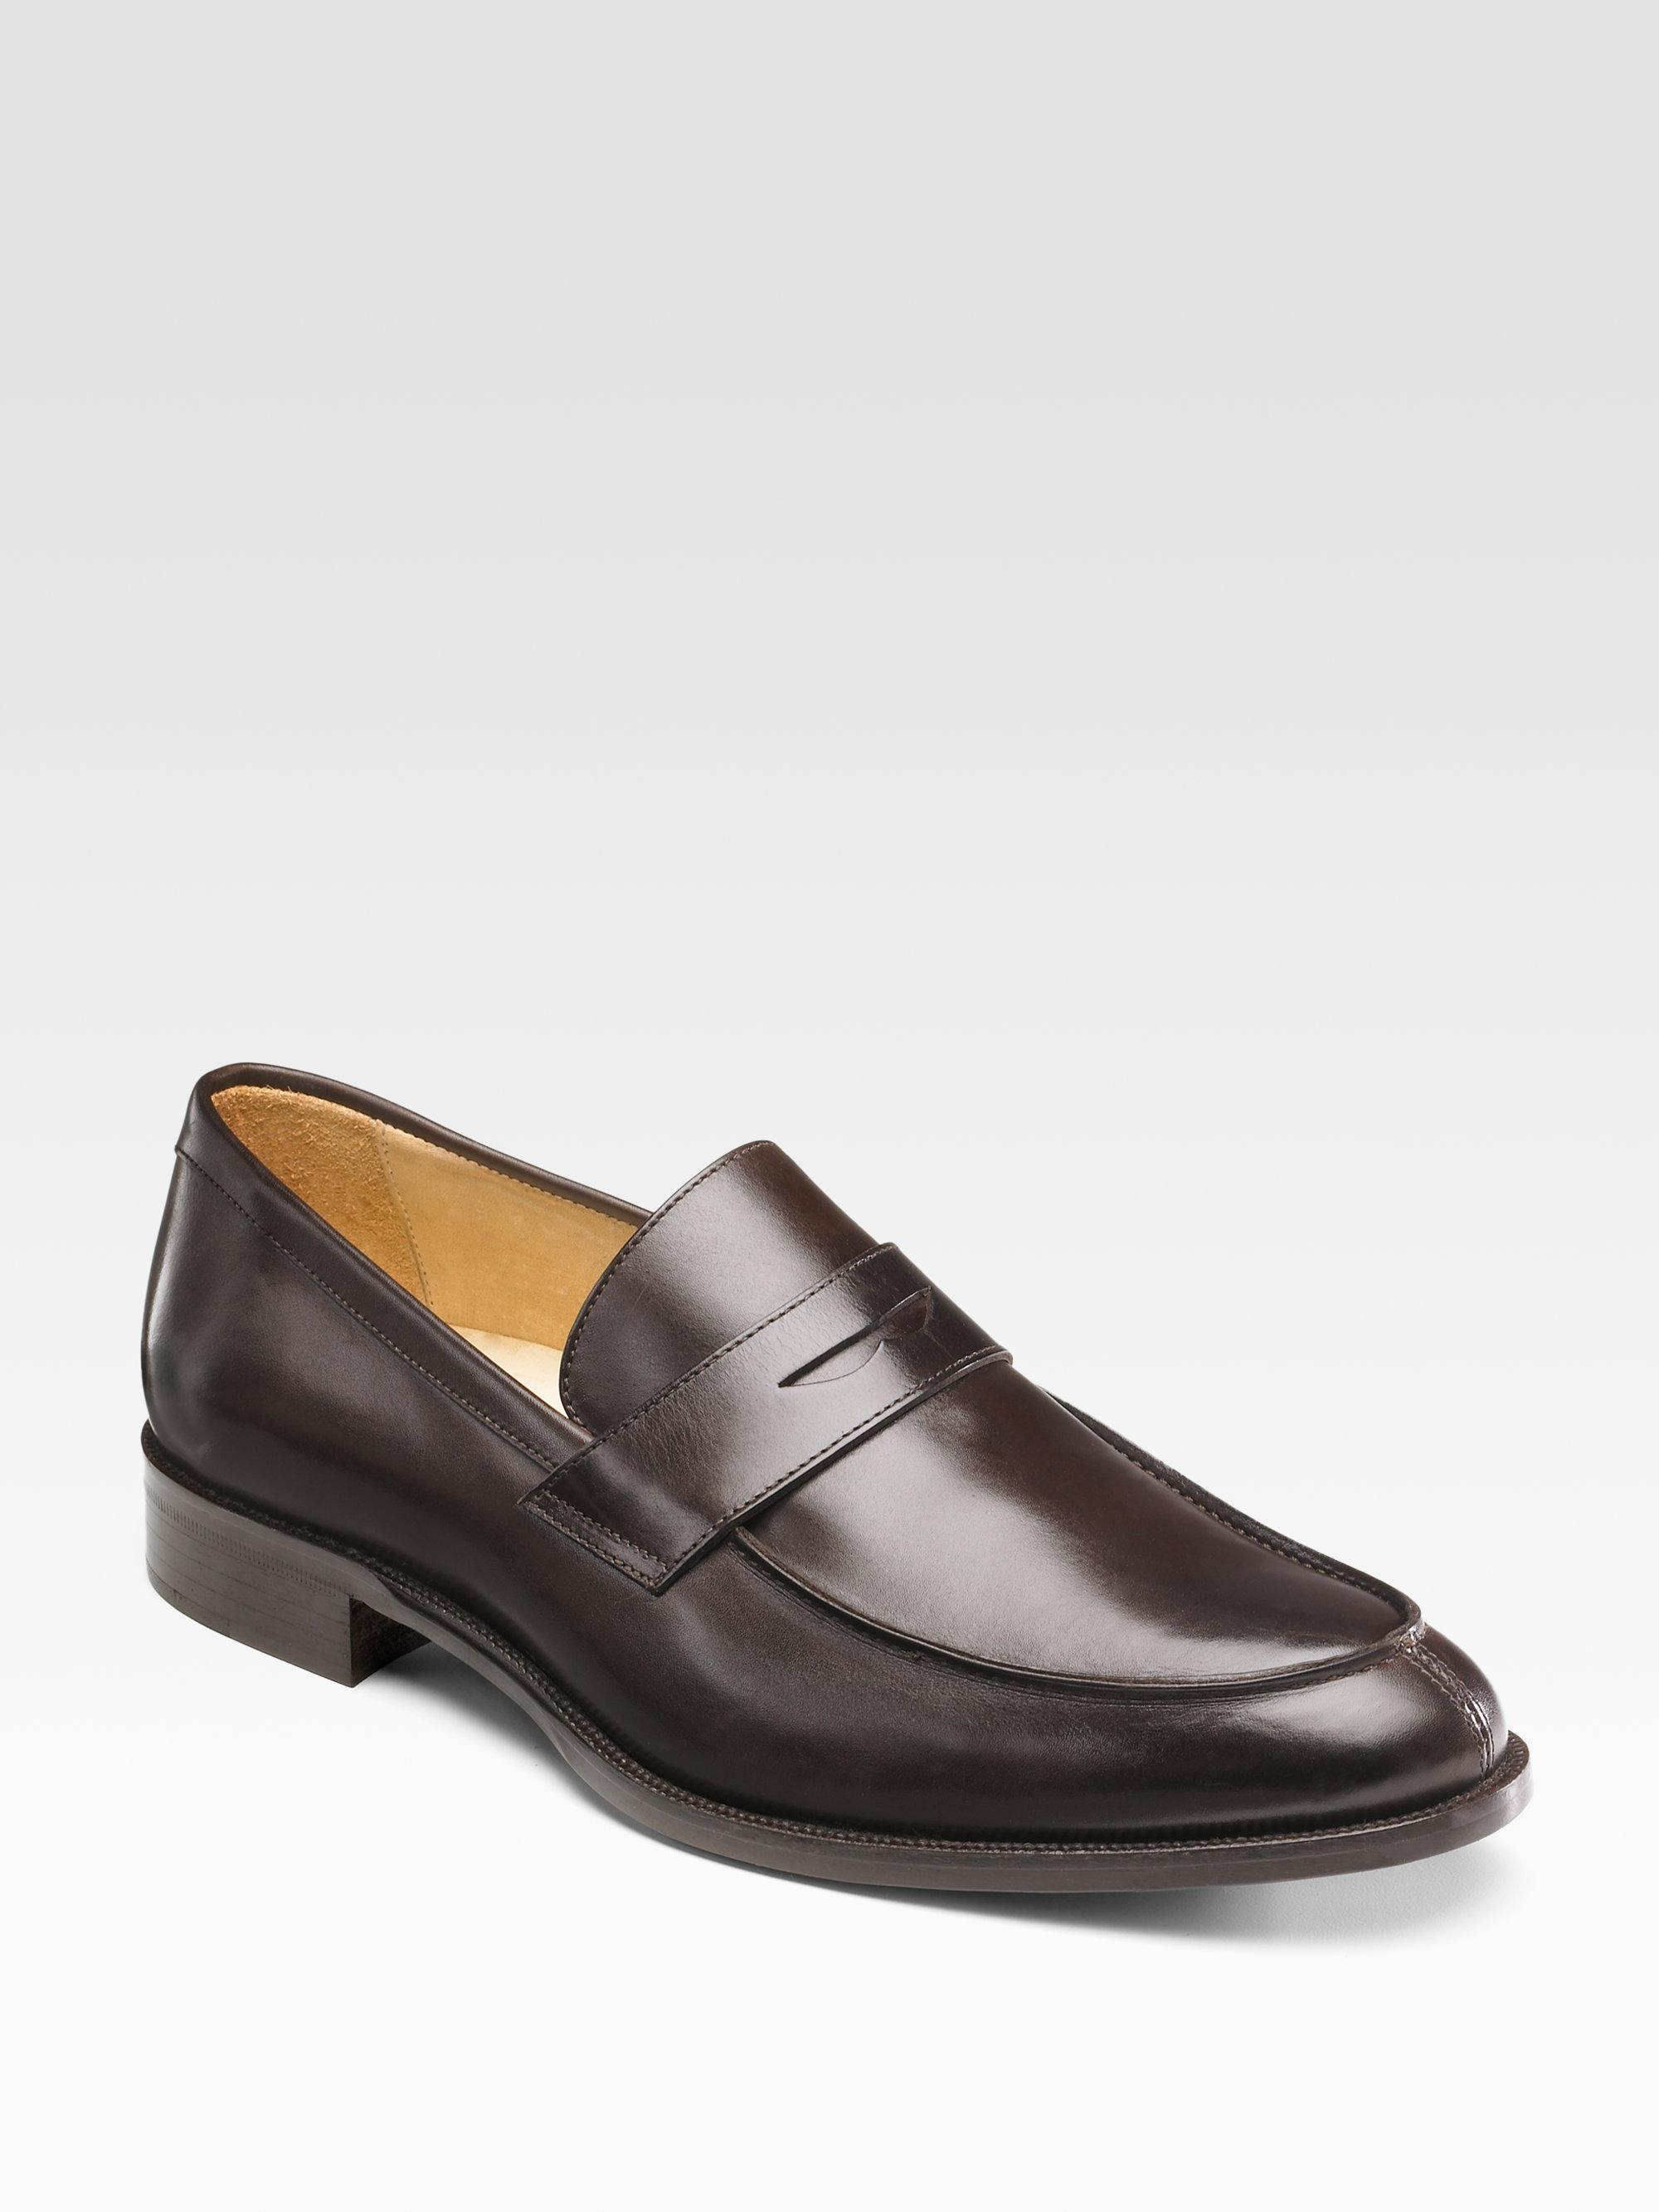 Saks Off Fifth Ferragamo Men Shoes